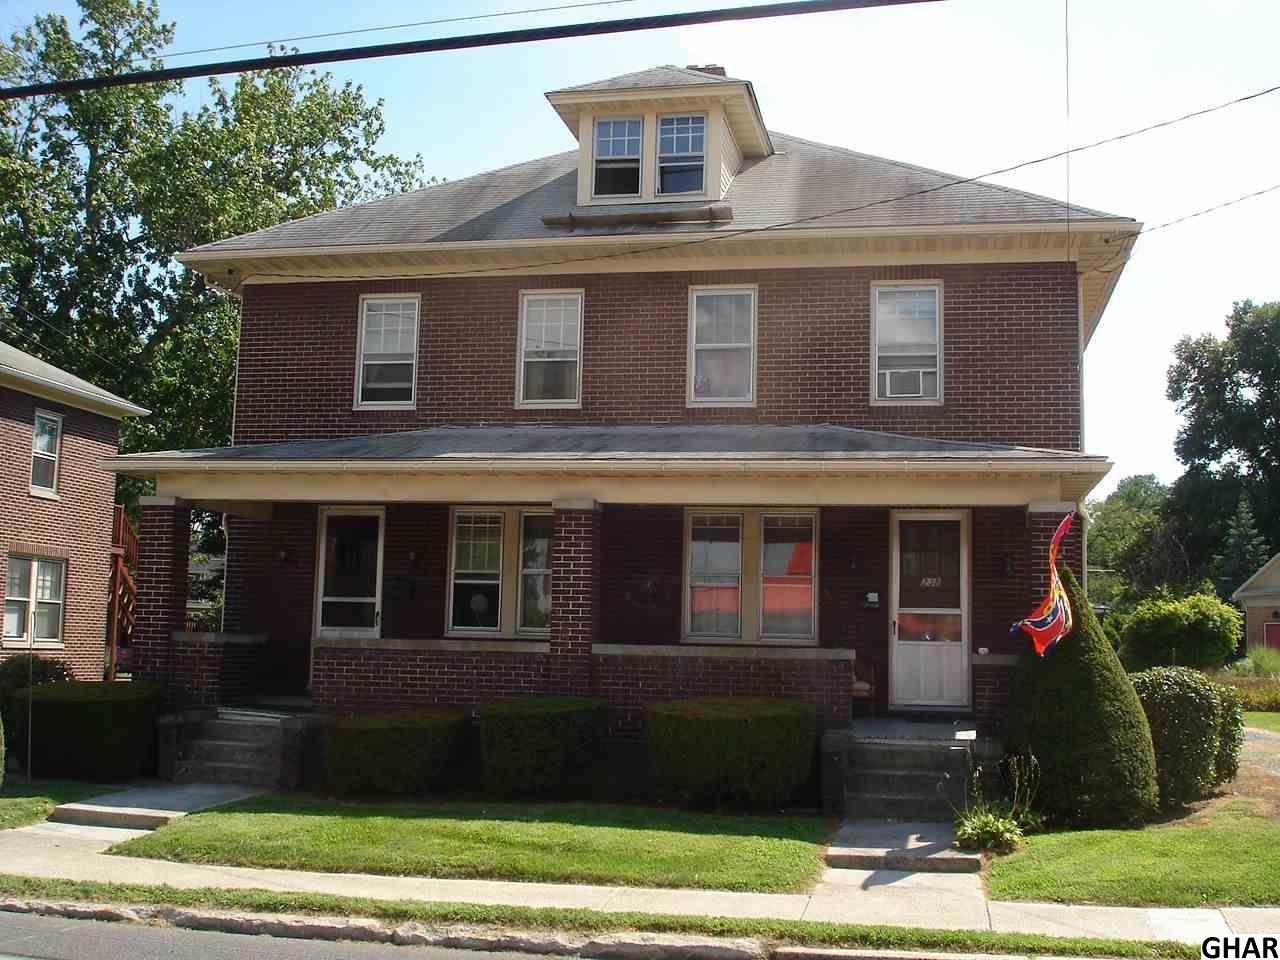 Commercial Property for Sale, ListingId:36316014, location: 236 Buford Avenue Gettysburg 17325